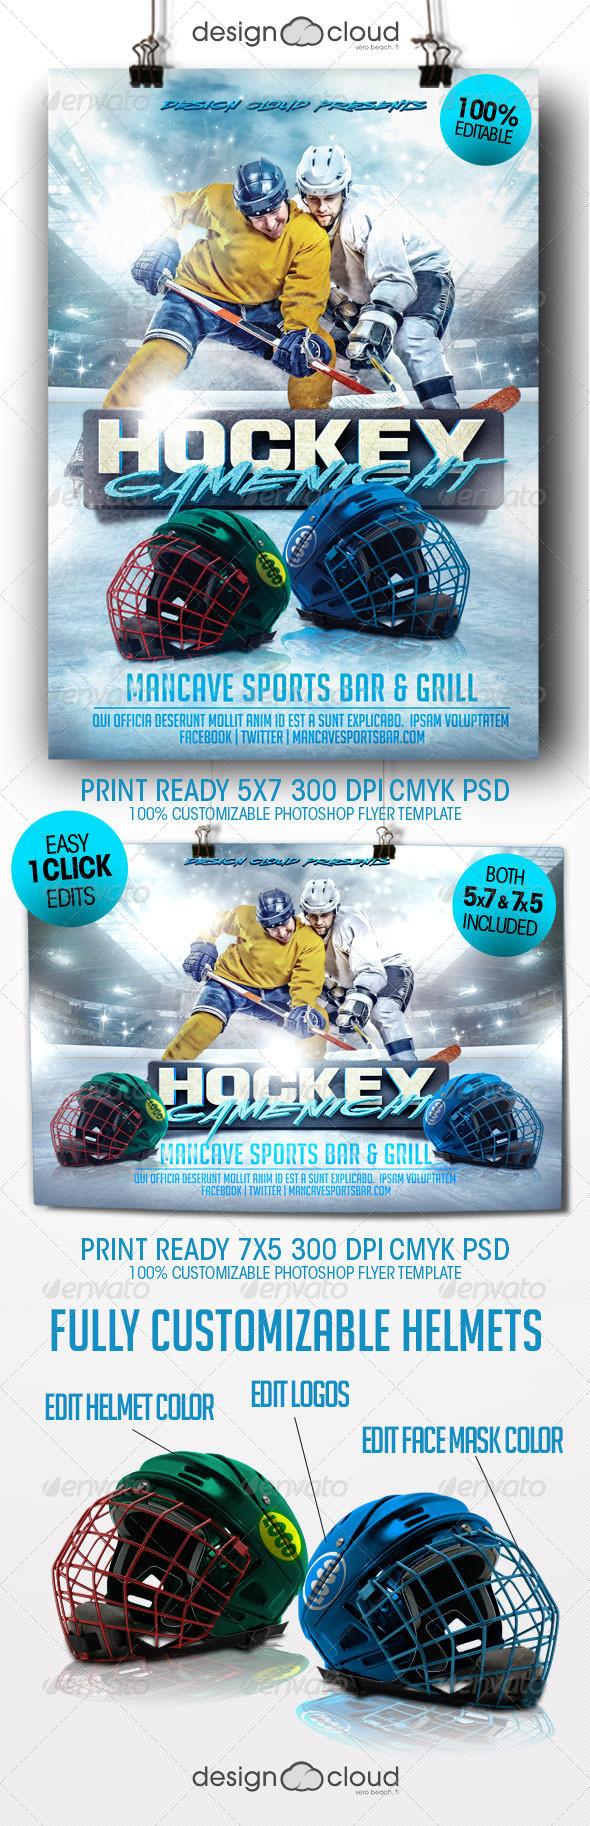 hockey game night flyer template themestack net